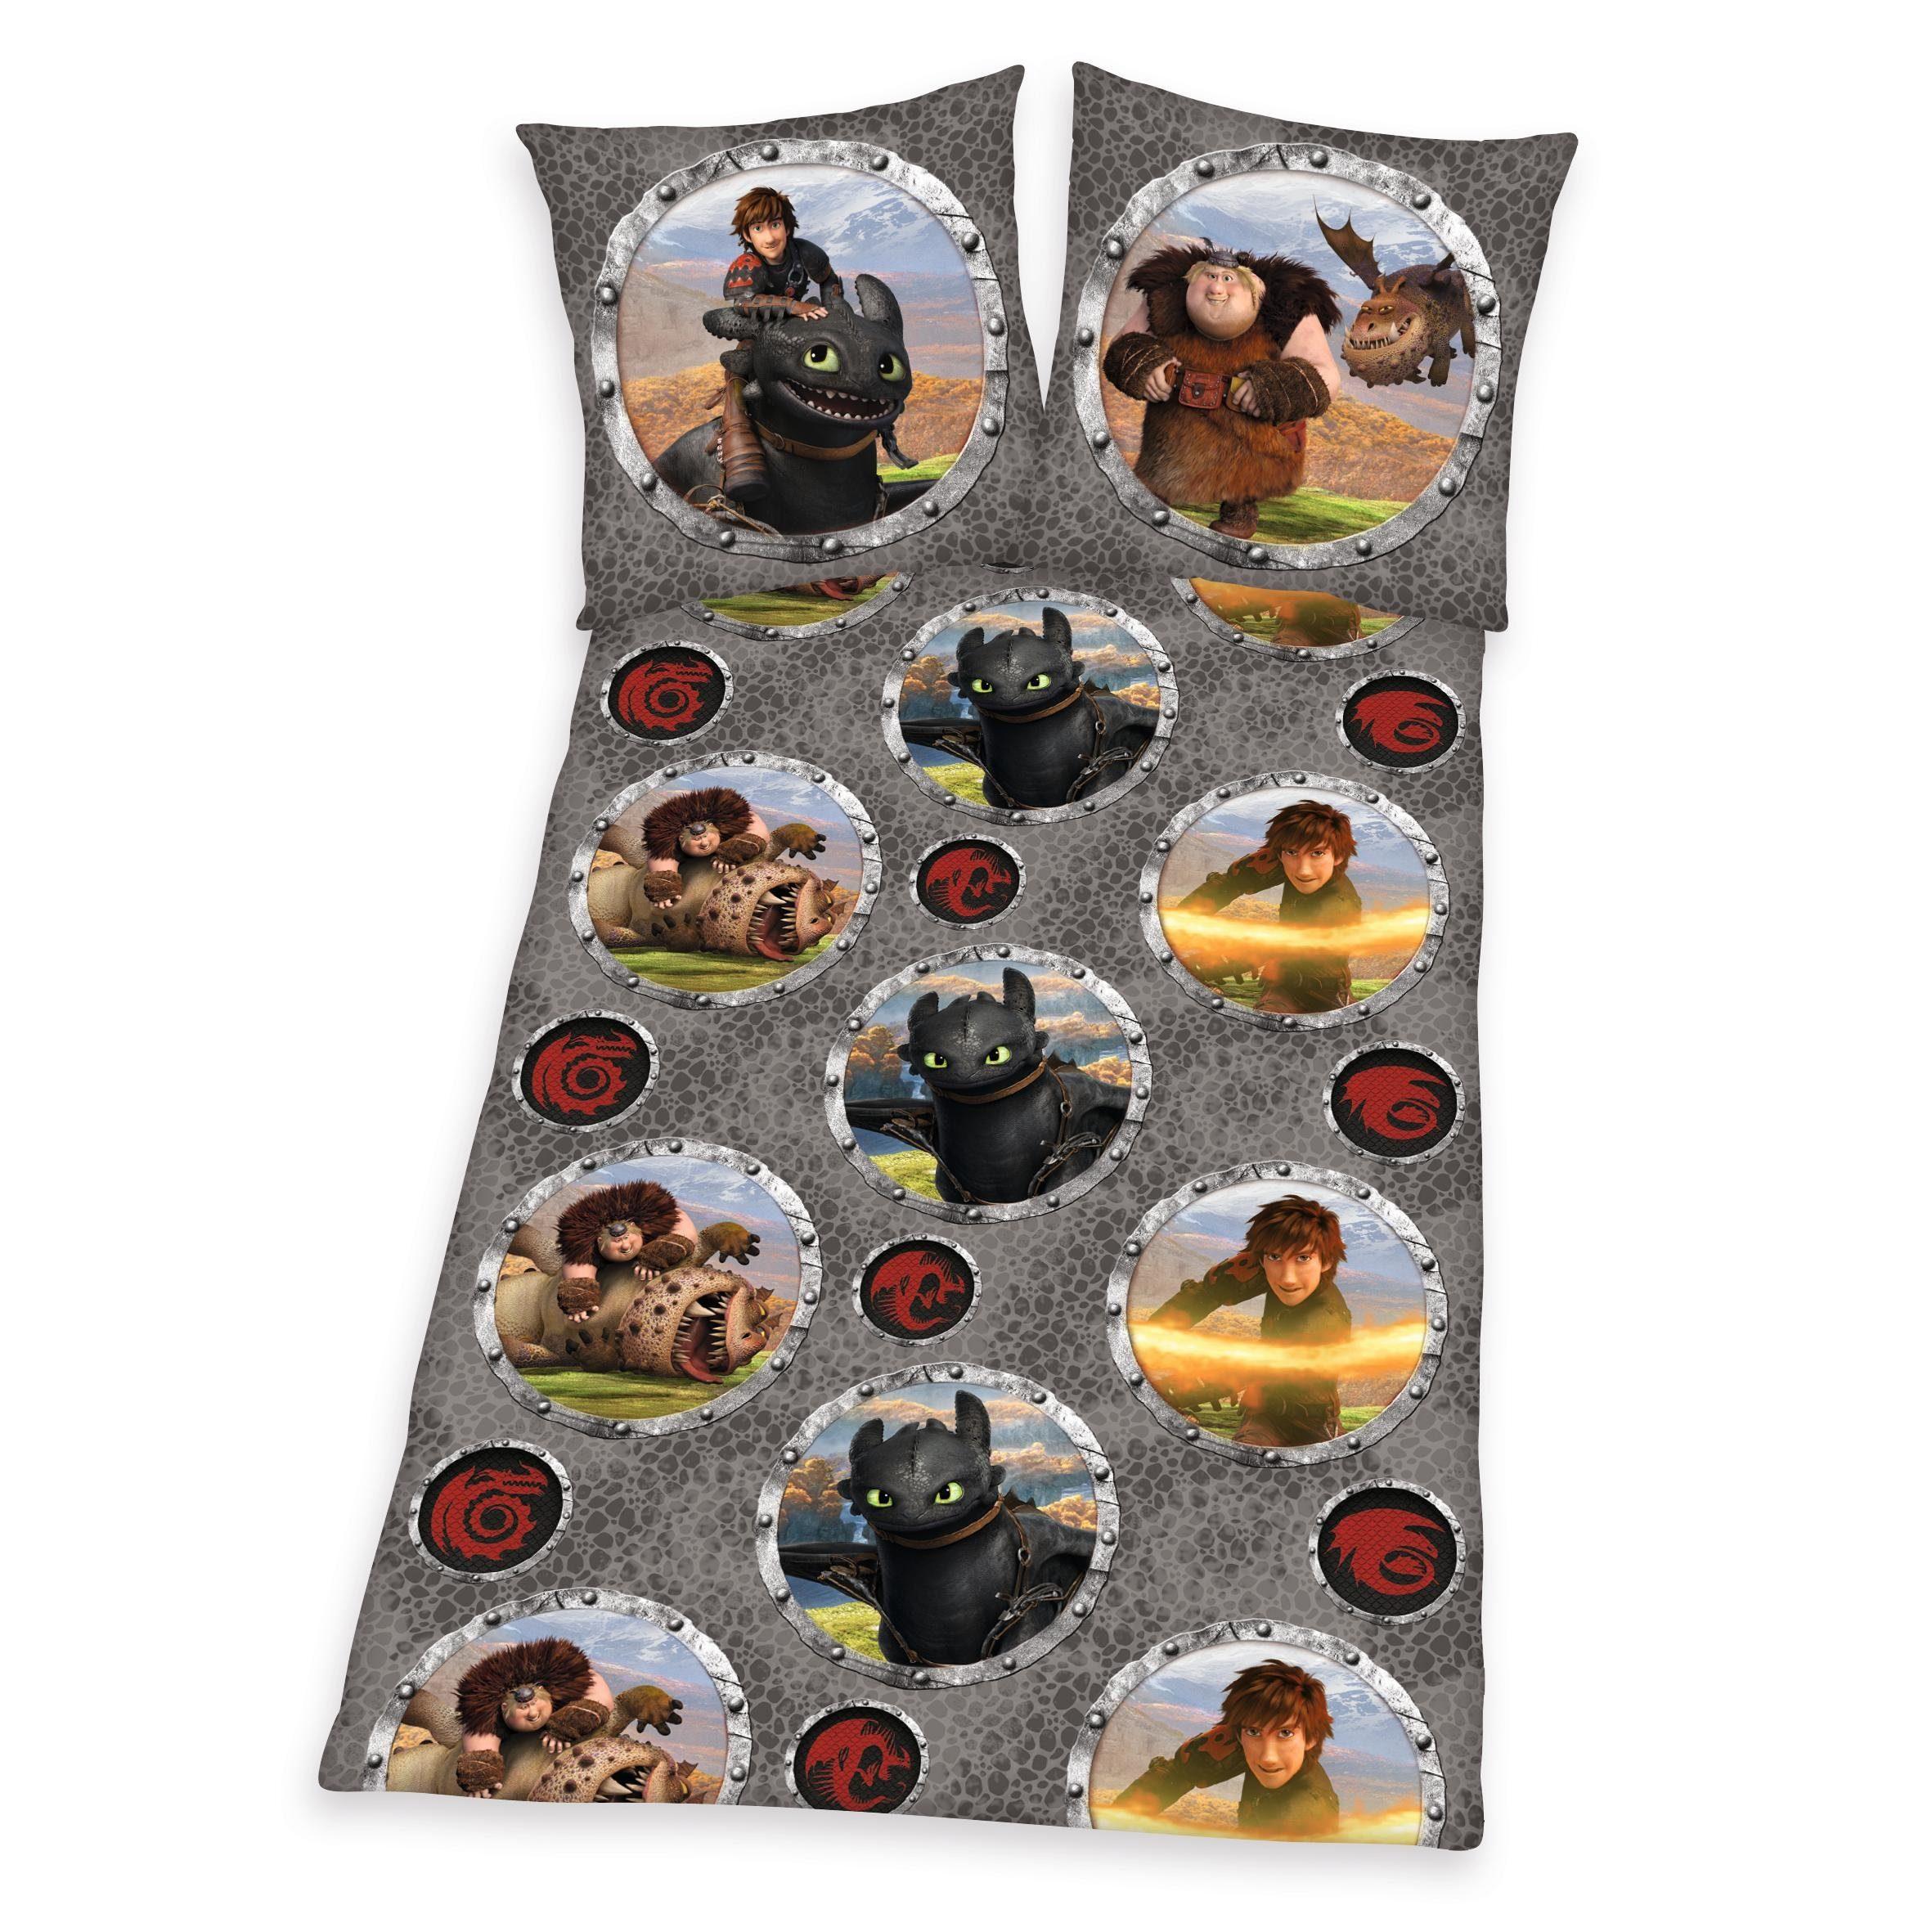 Bettwäsche, Dragons, »Drachenkampf«, mit Drachen-Motiven verziert